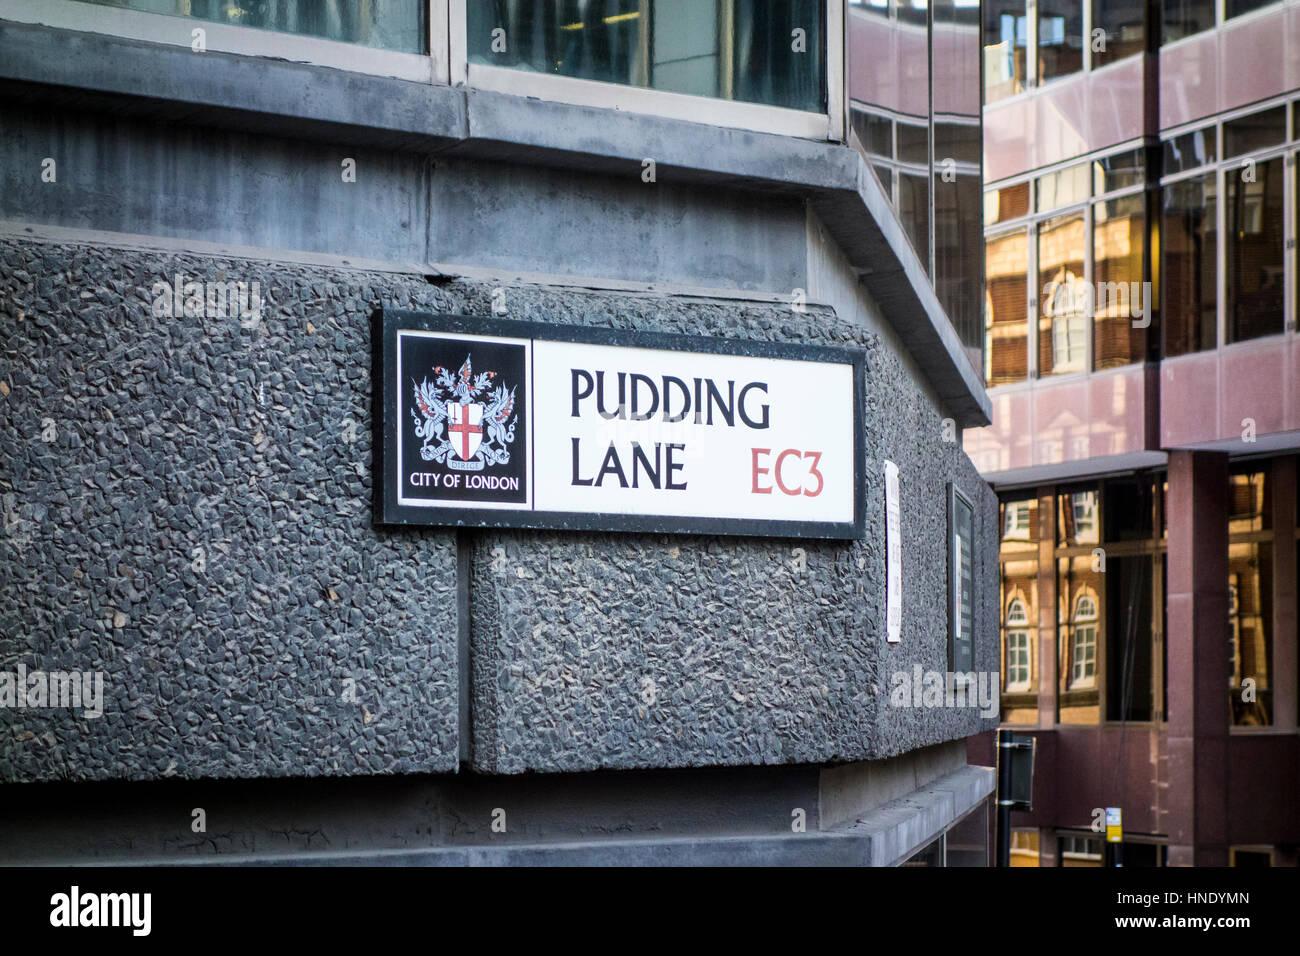 Pudding Lane road sign, City of London, UK - Stock Image